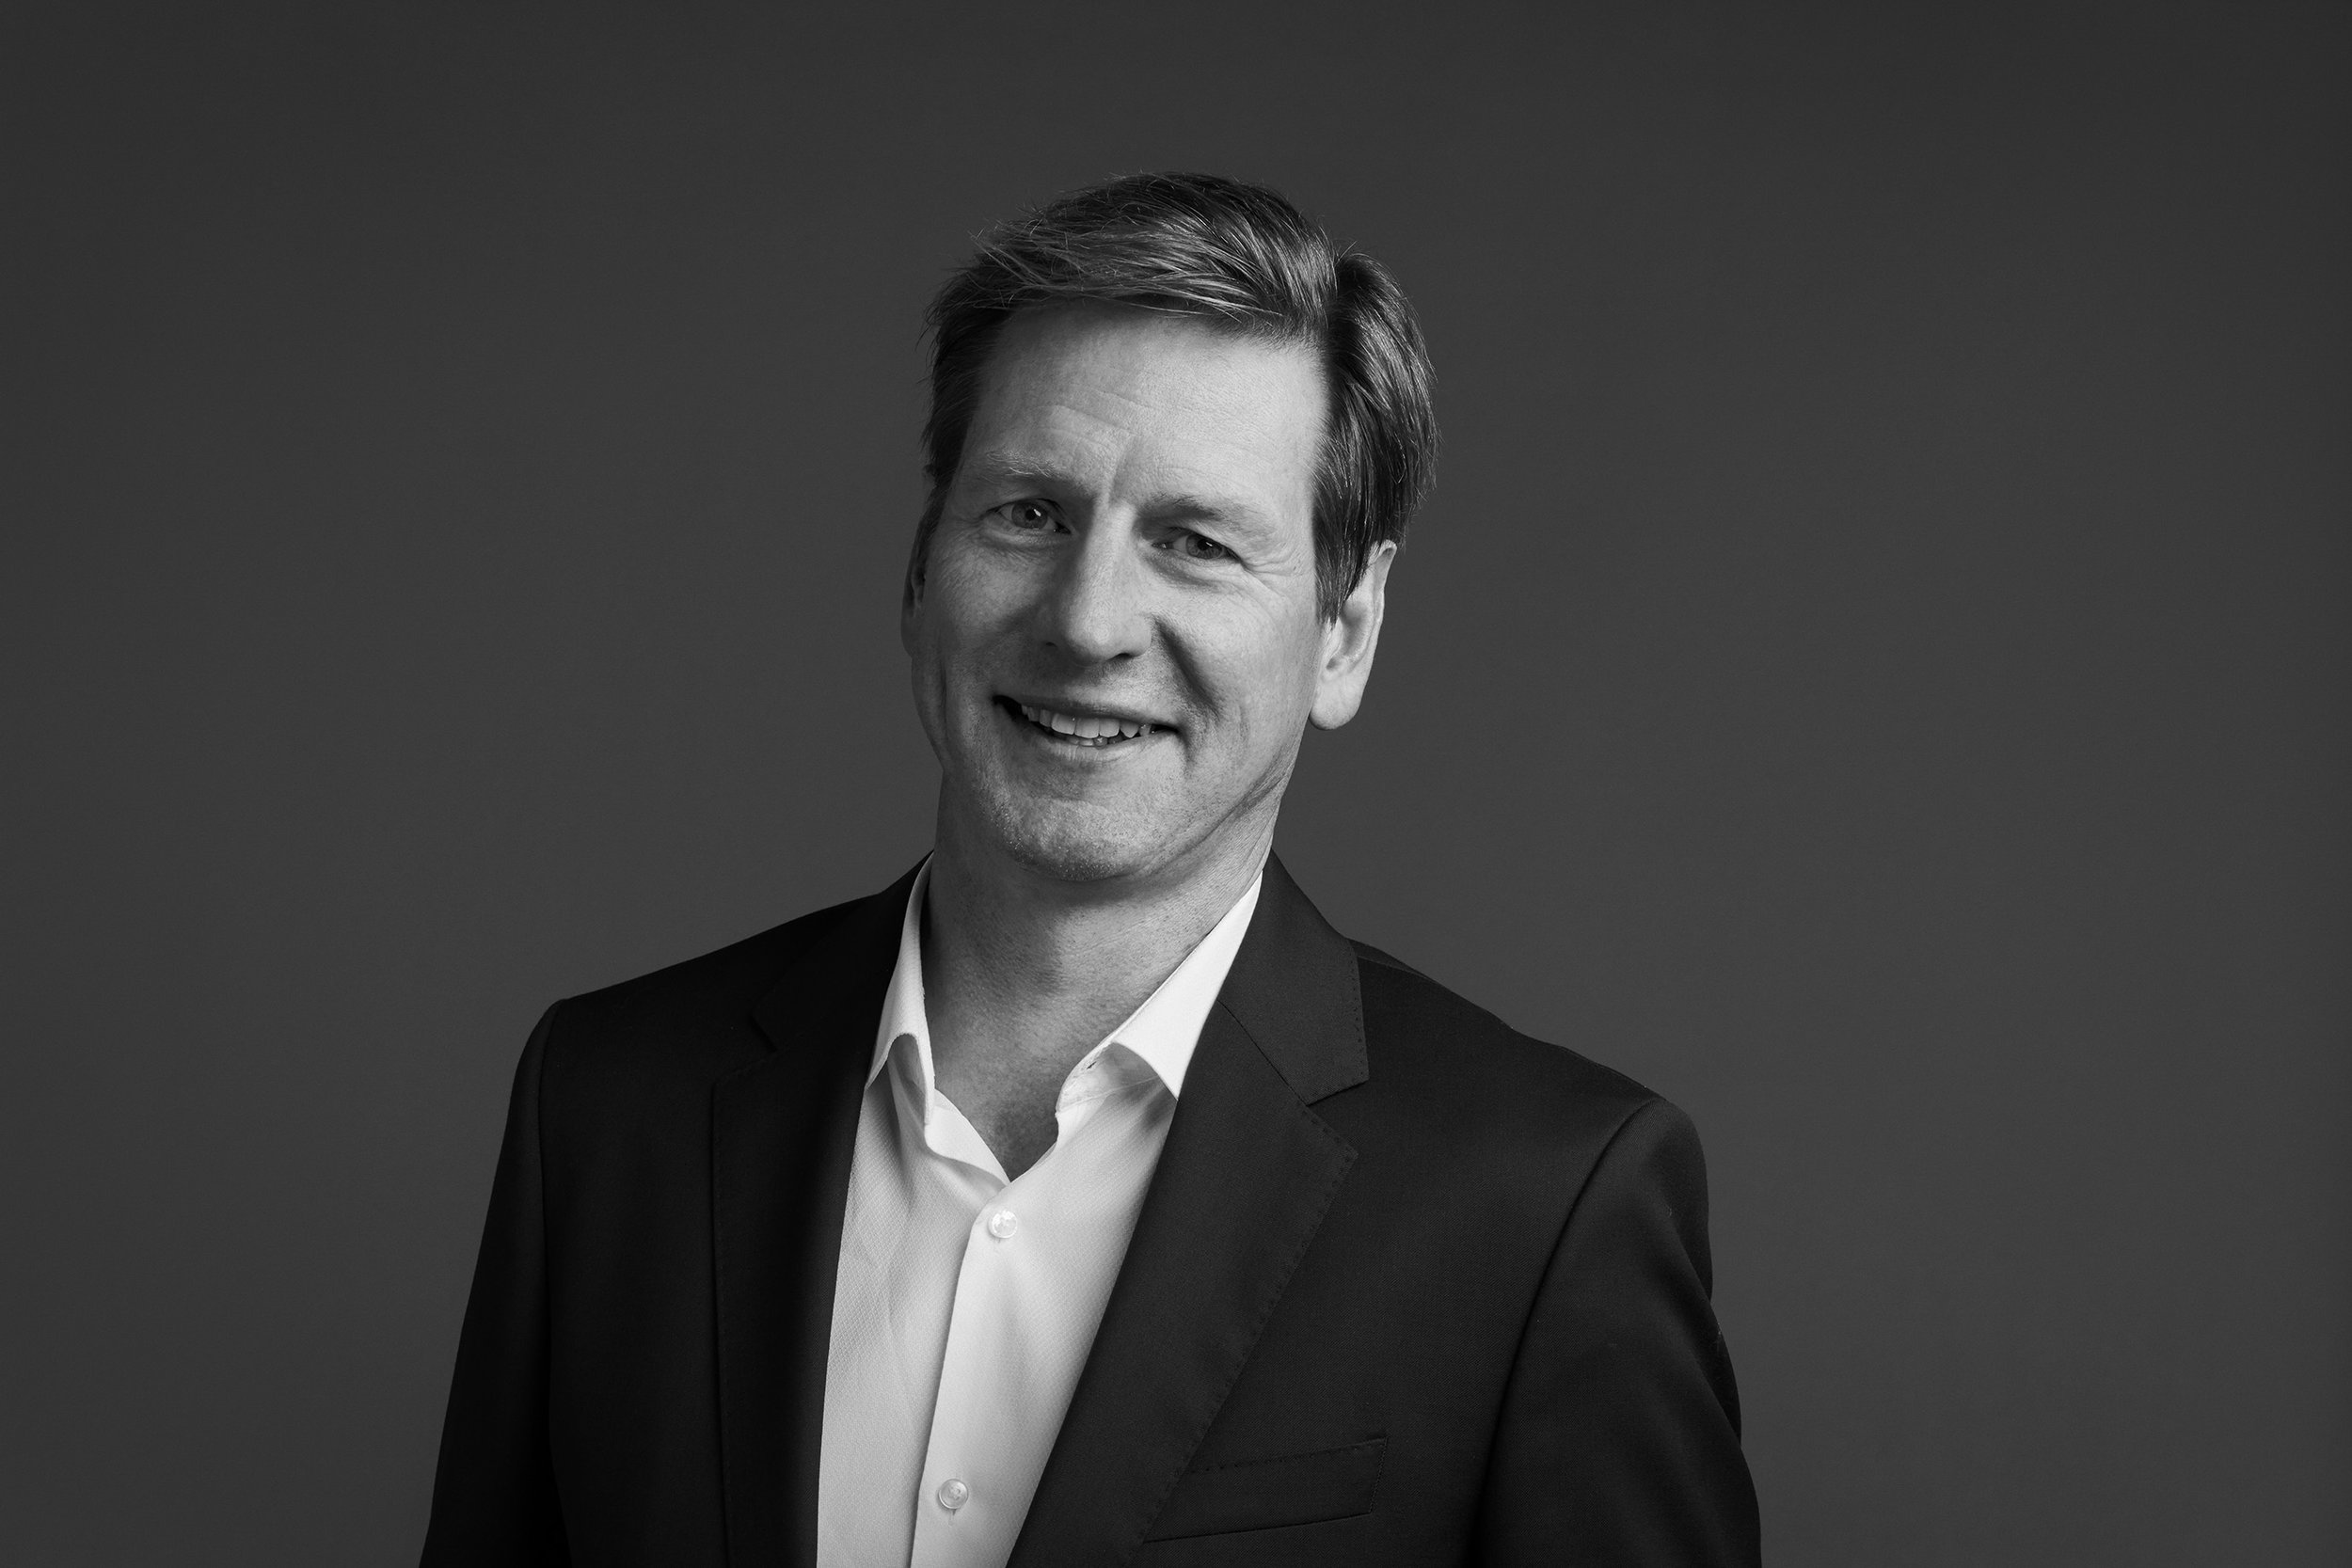 TRACK ANZ CEO Rob Limb